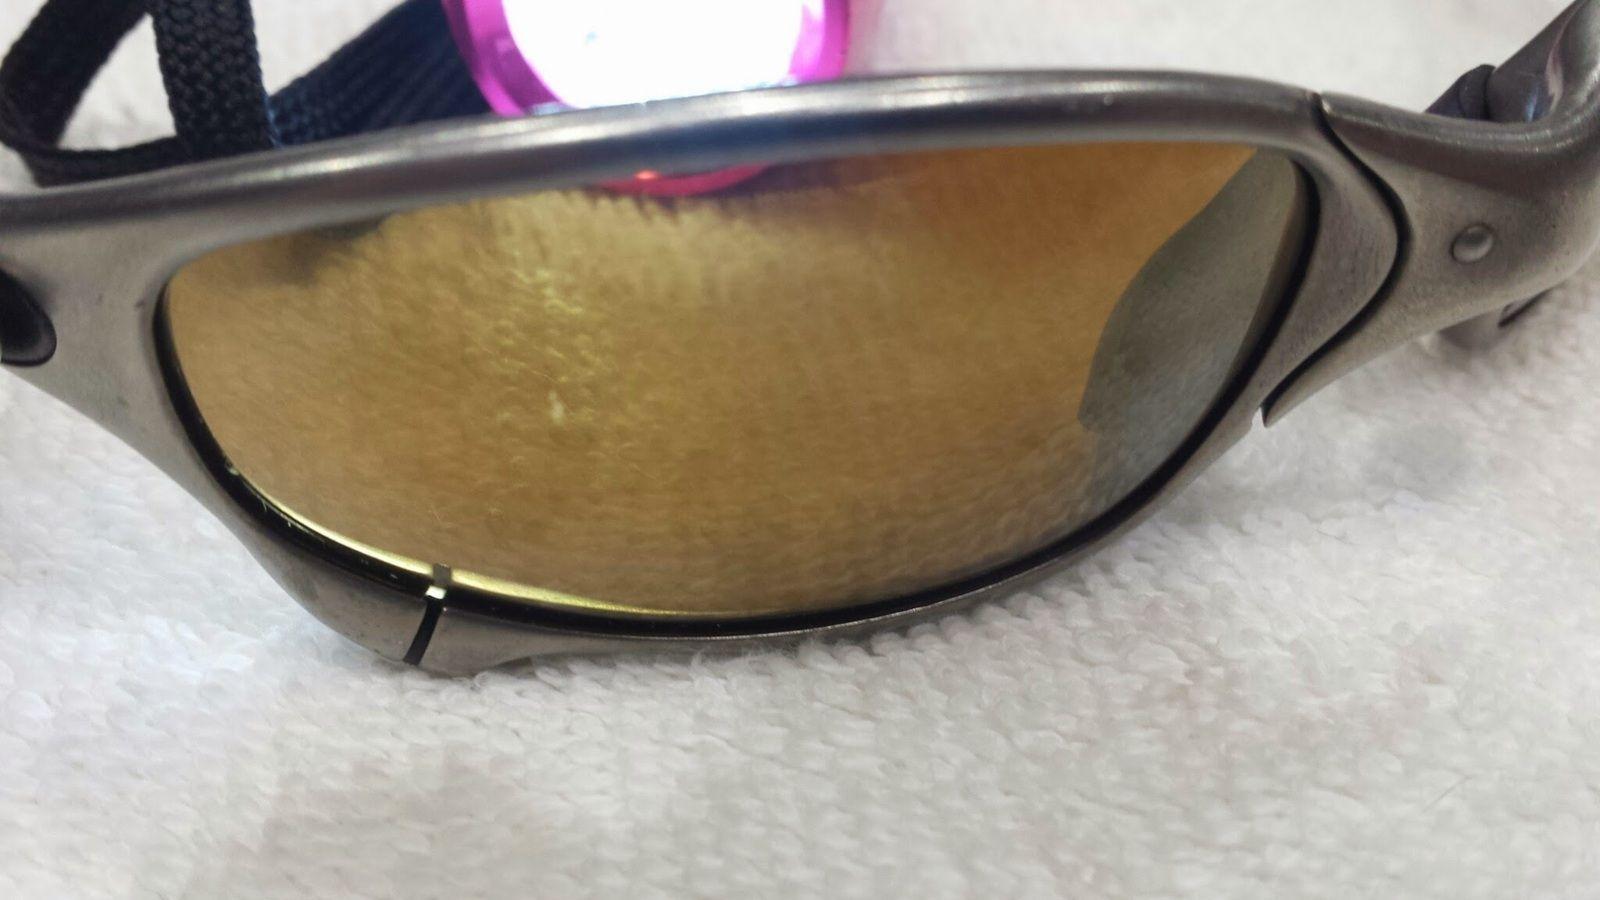 Juliet Titanium Serialized T######A - $240 Shipped - 20140320_194353.jpg